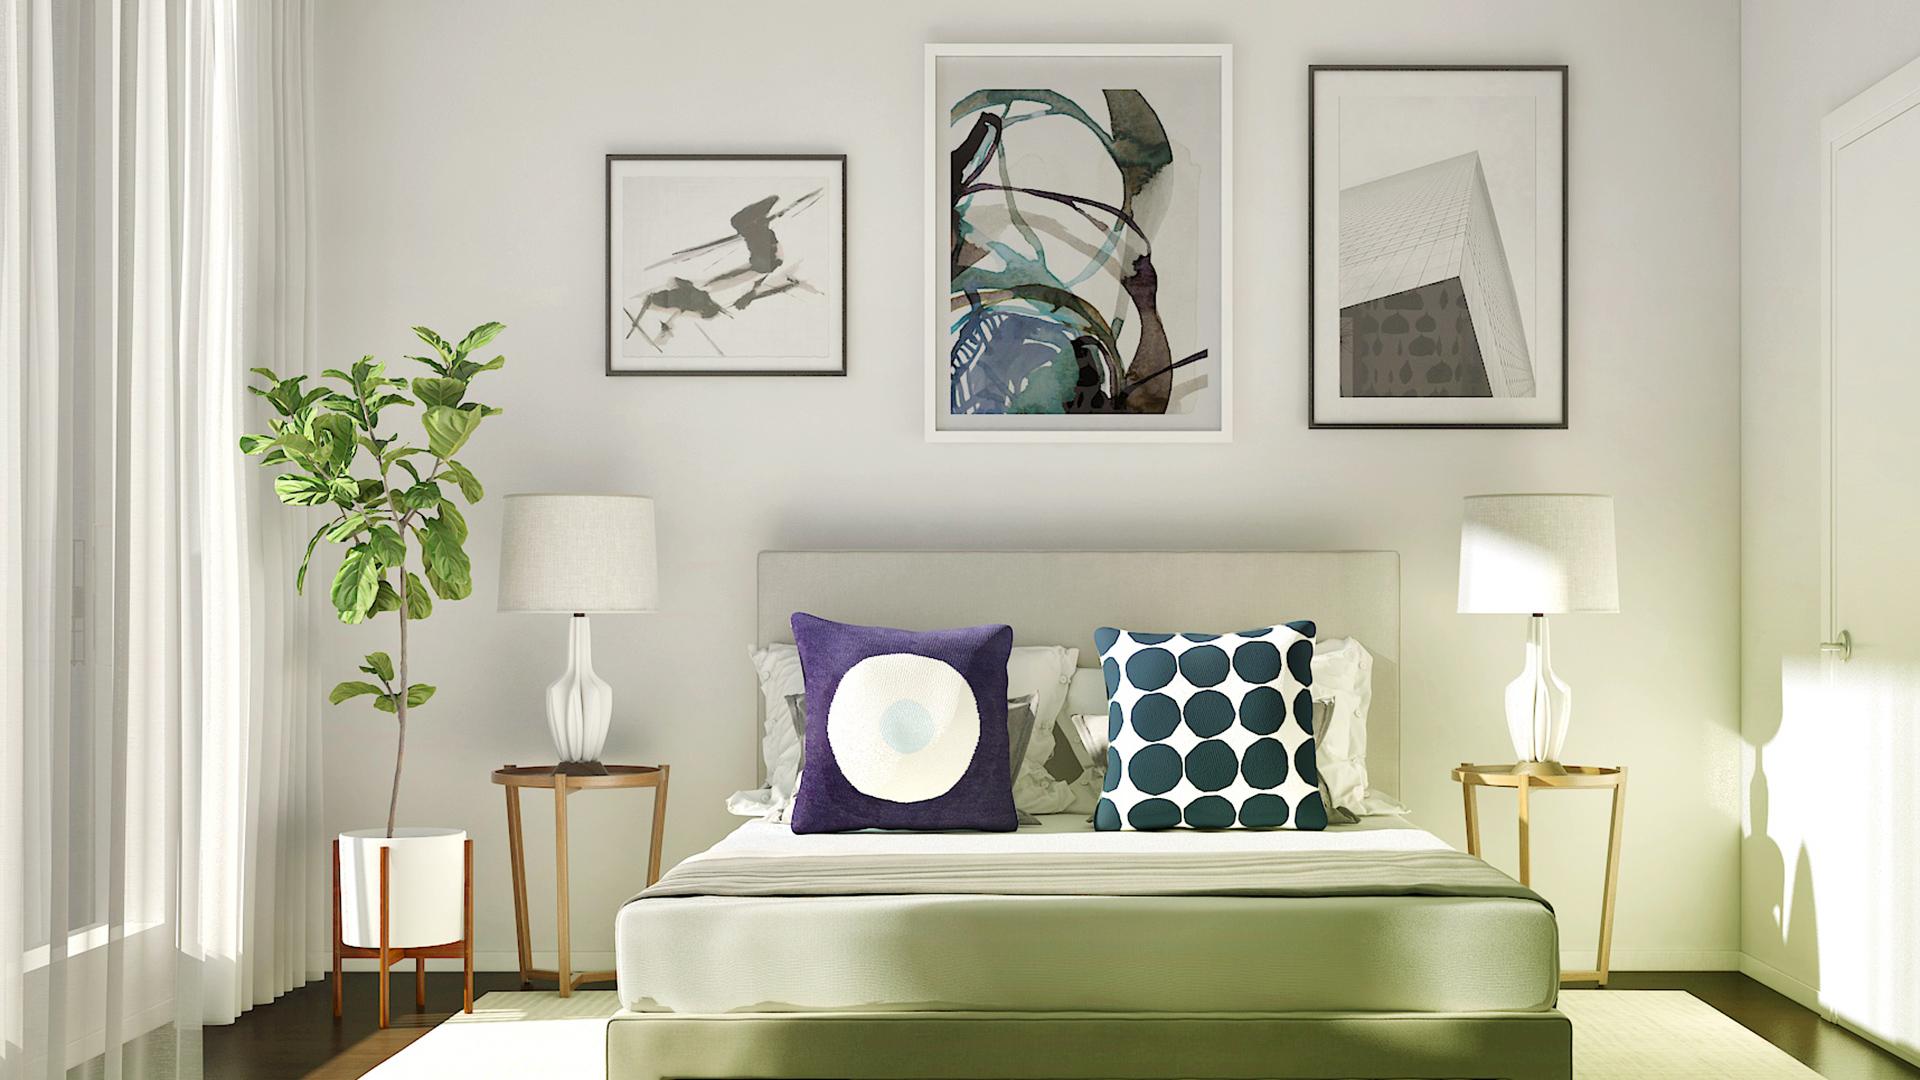 fruitesborrascom 100 Home Design Companies Images The Best